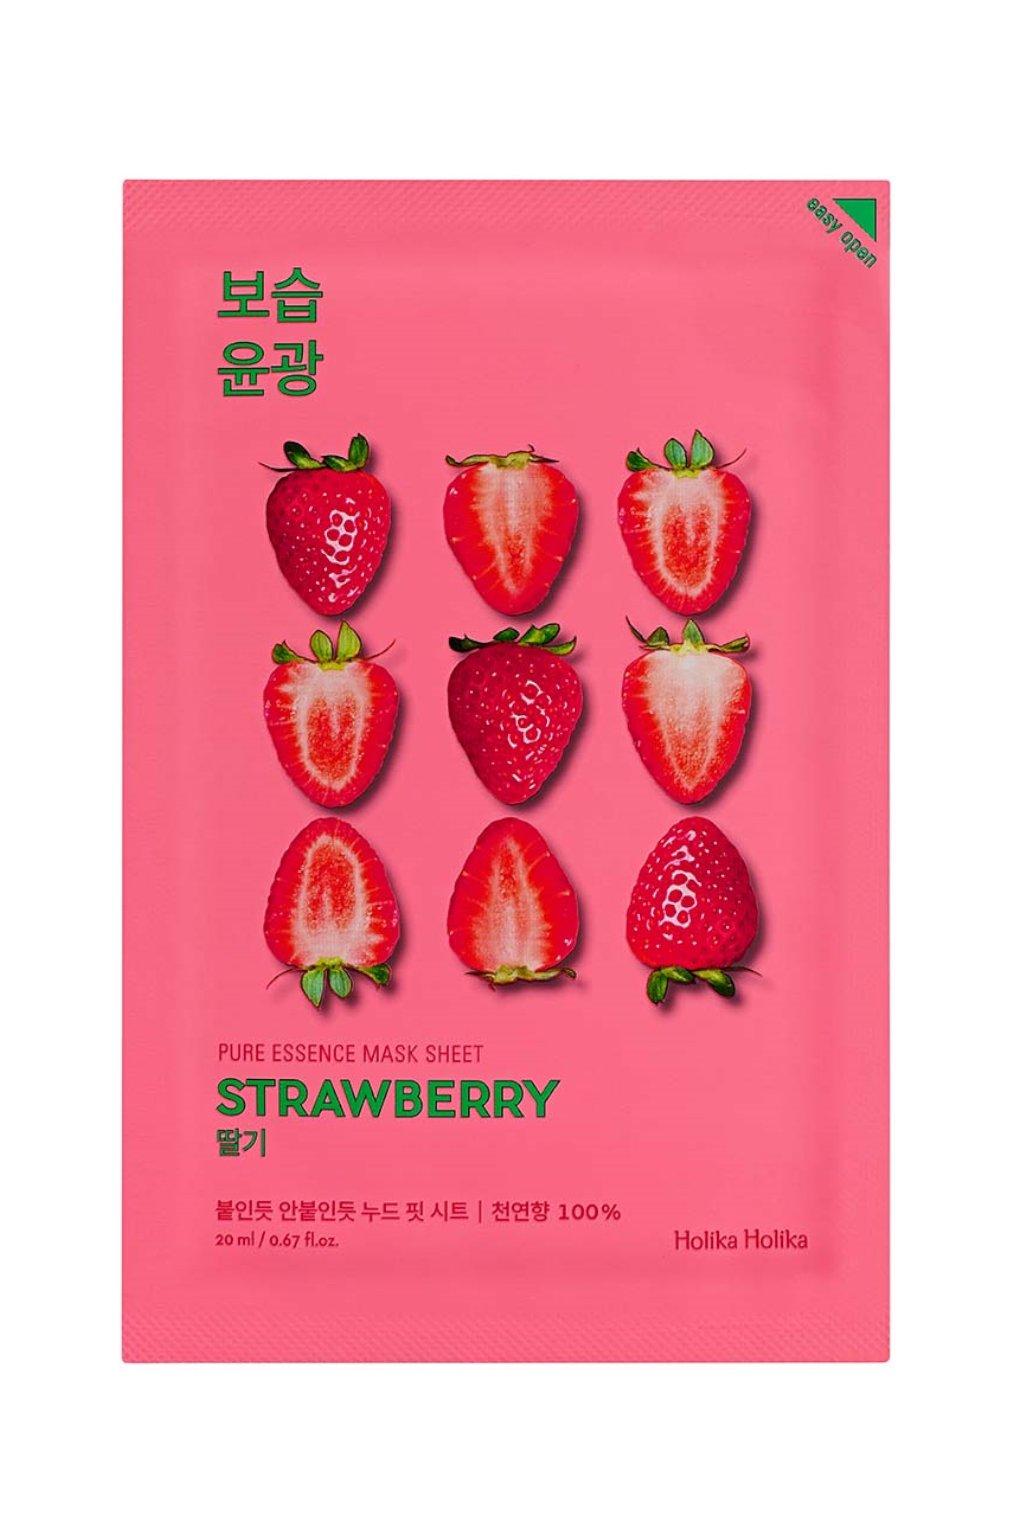 Holika Holika Pure Essence Strawberry Mask 1024x1364